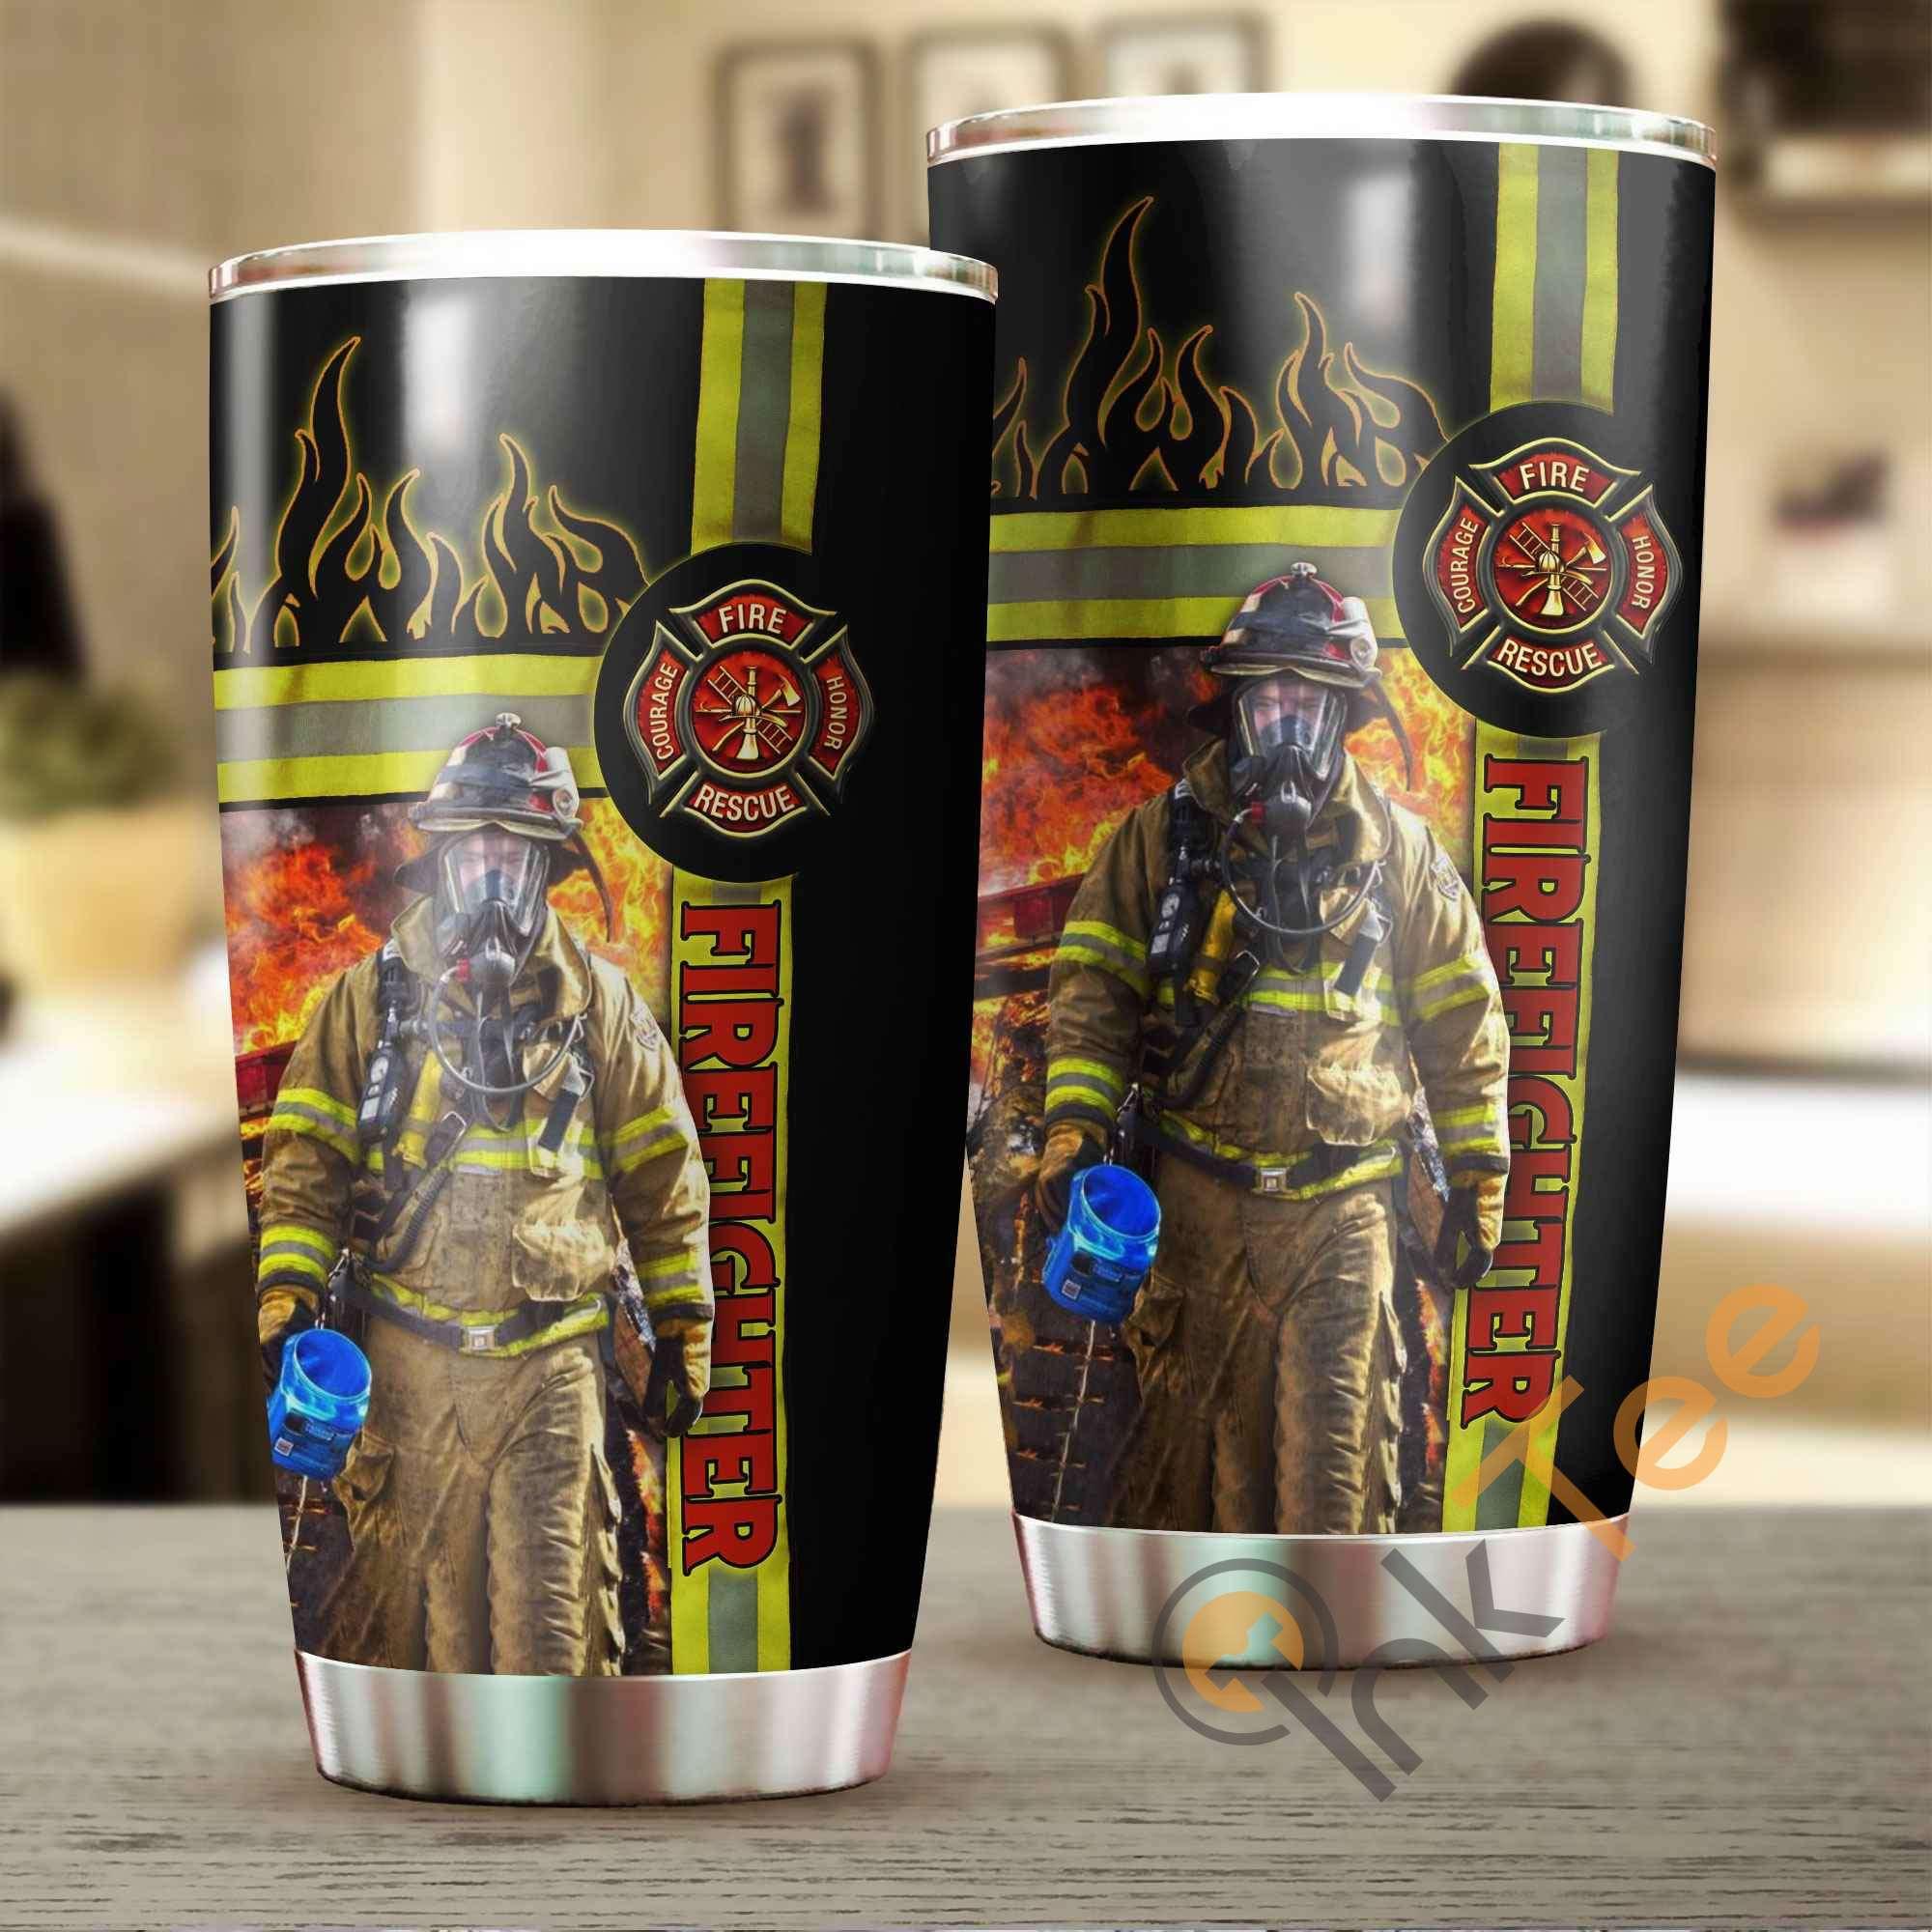 I'm A Firefighter Amazon Best Seller Sku 3010 Stainless Steel Tumbler